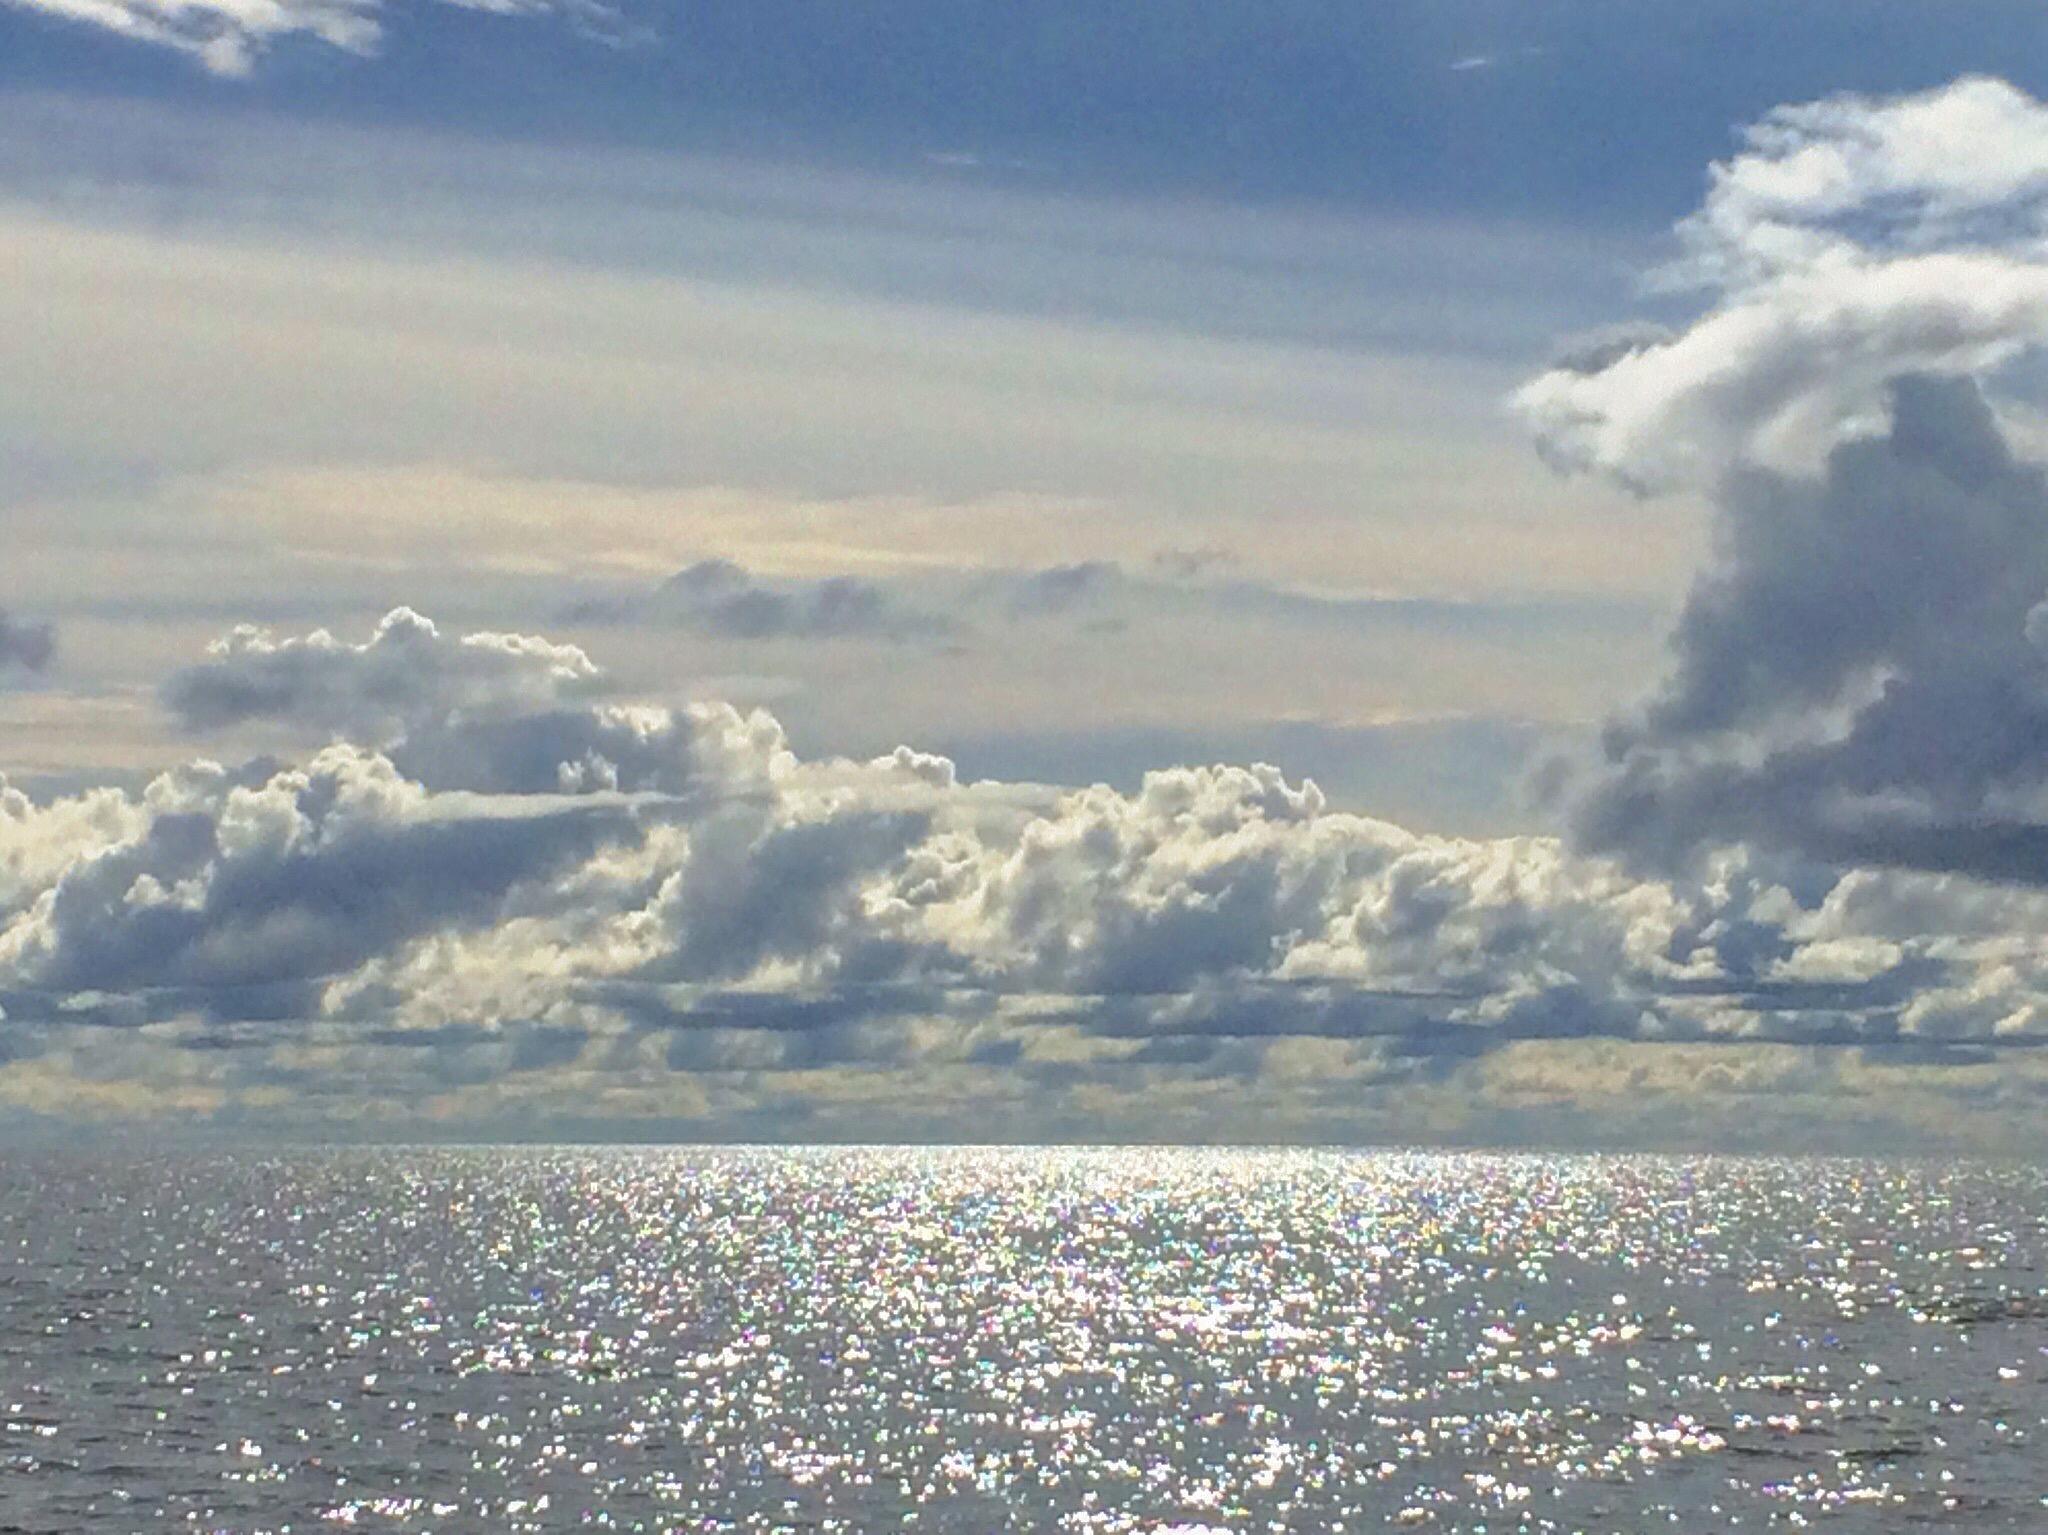 sky_deck_view_boats_antrim_castle_walled_garden_lough_neagh_northern_ireland_ni_explorer_niexplorer